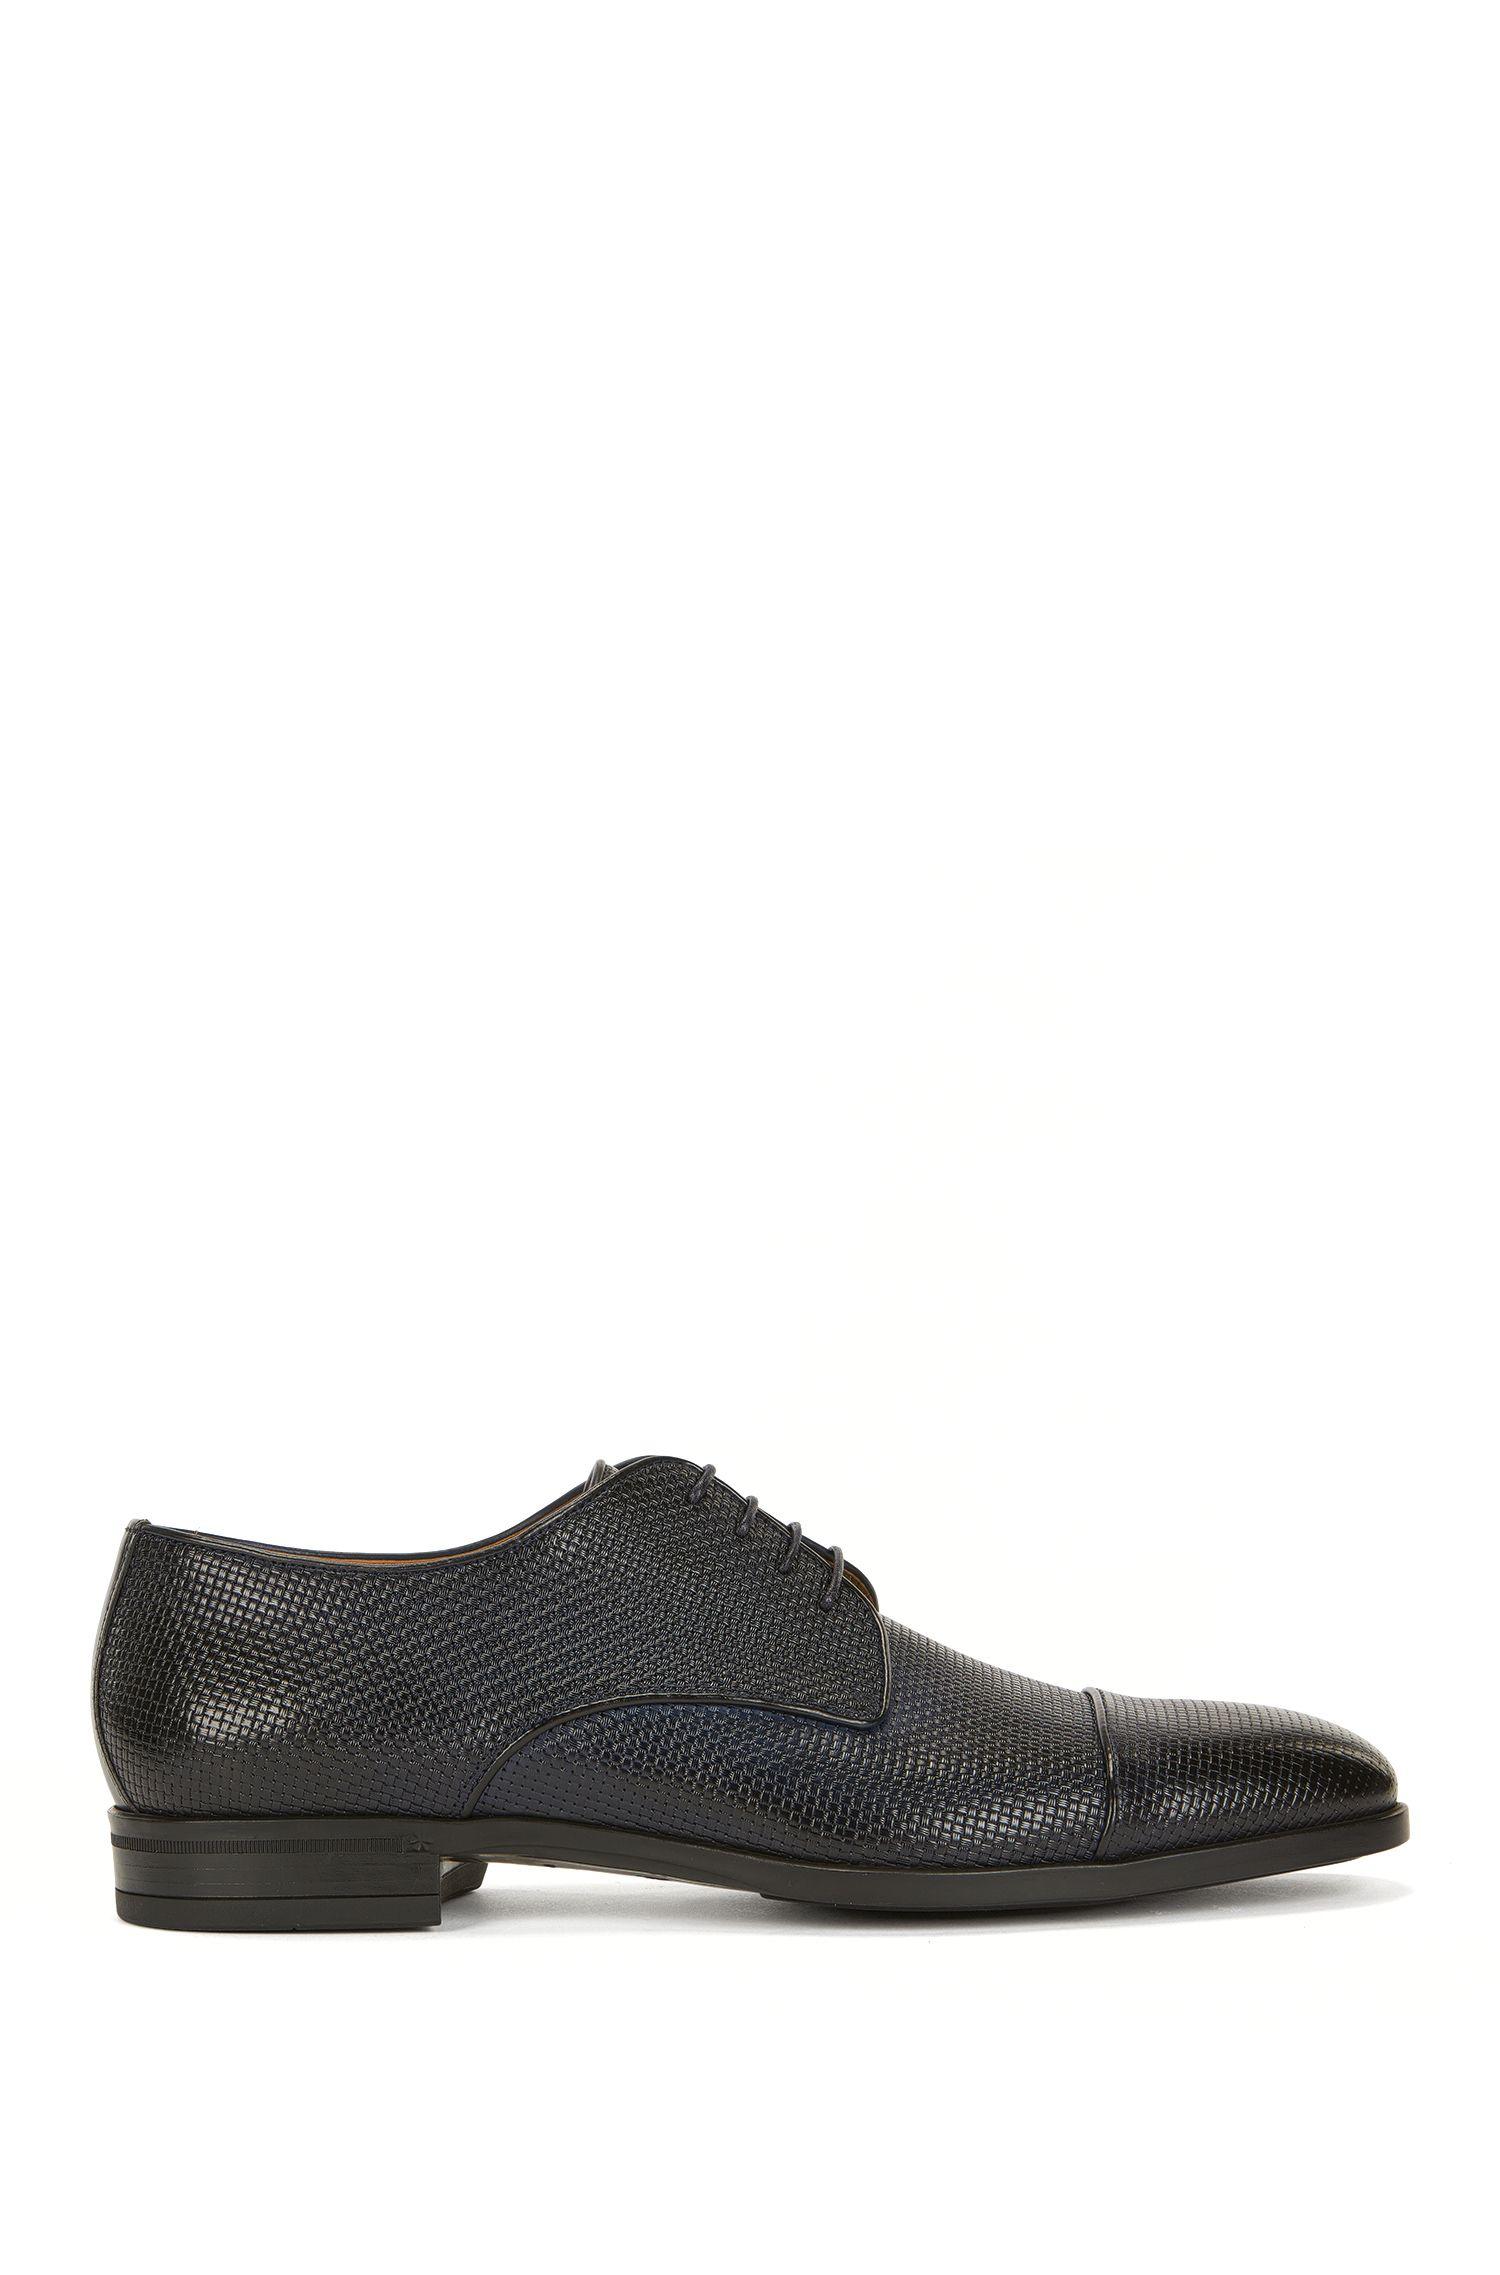 Embossed Leather Derby Shoe | Kensington Derb